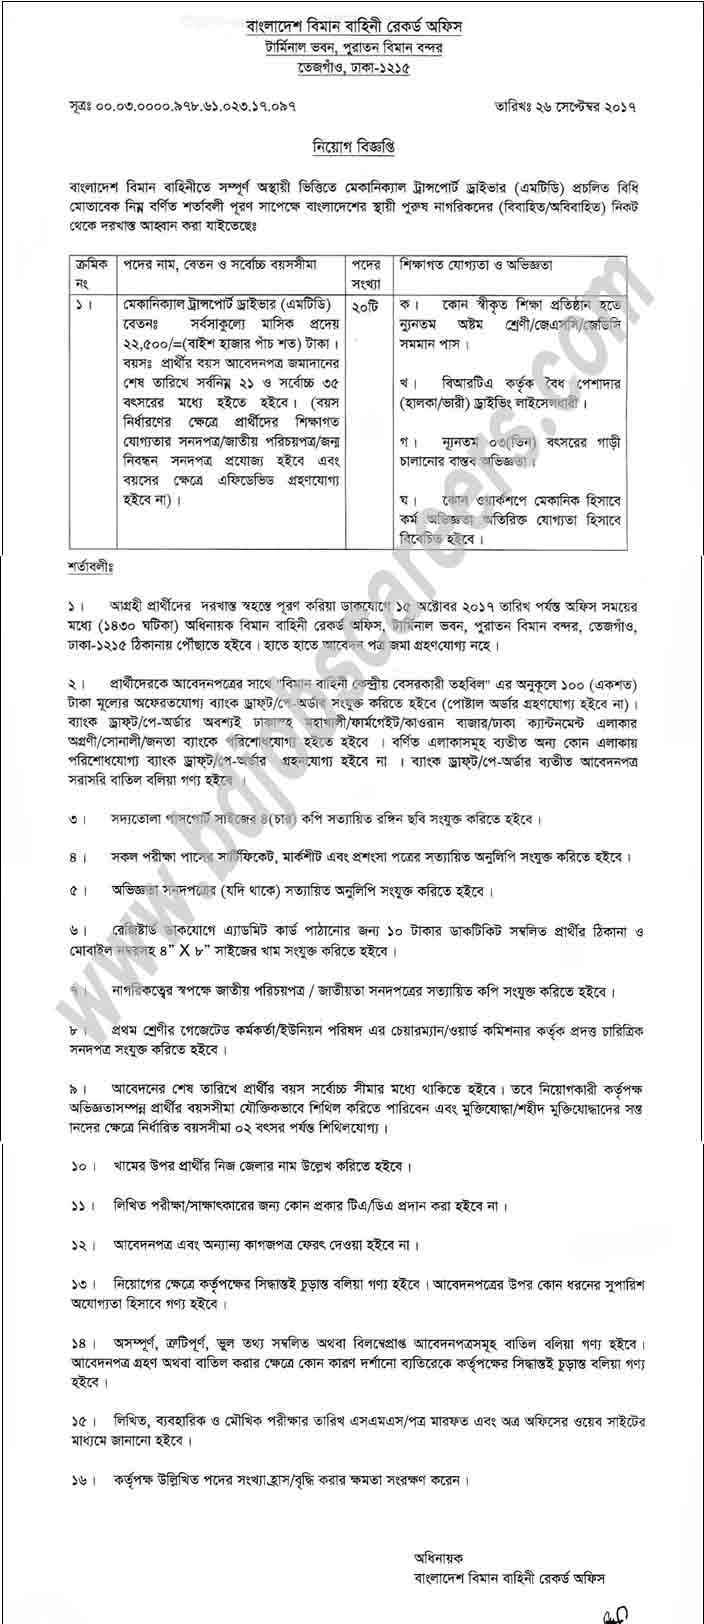 Bangladesh-Air-Force-Job-Circular-2017